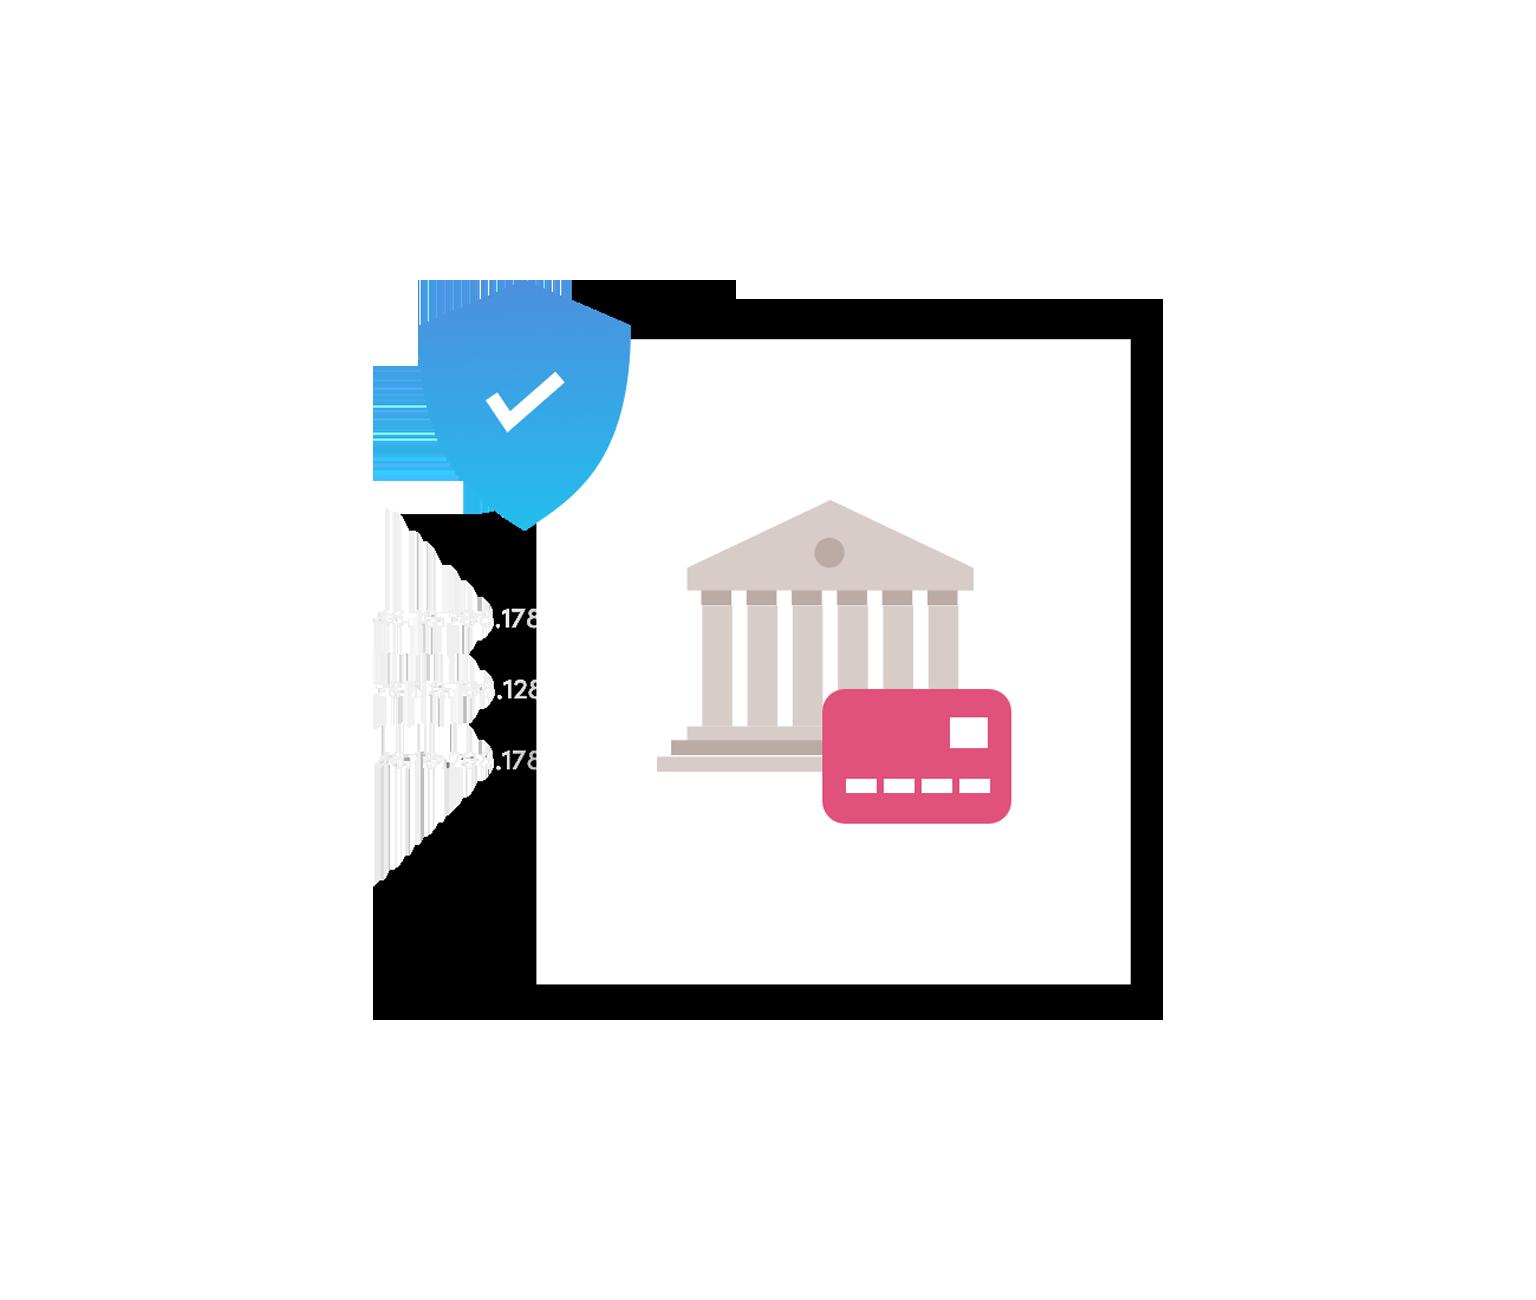 bank_security-backgr